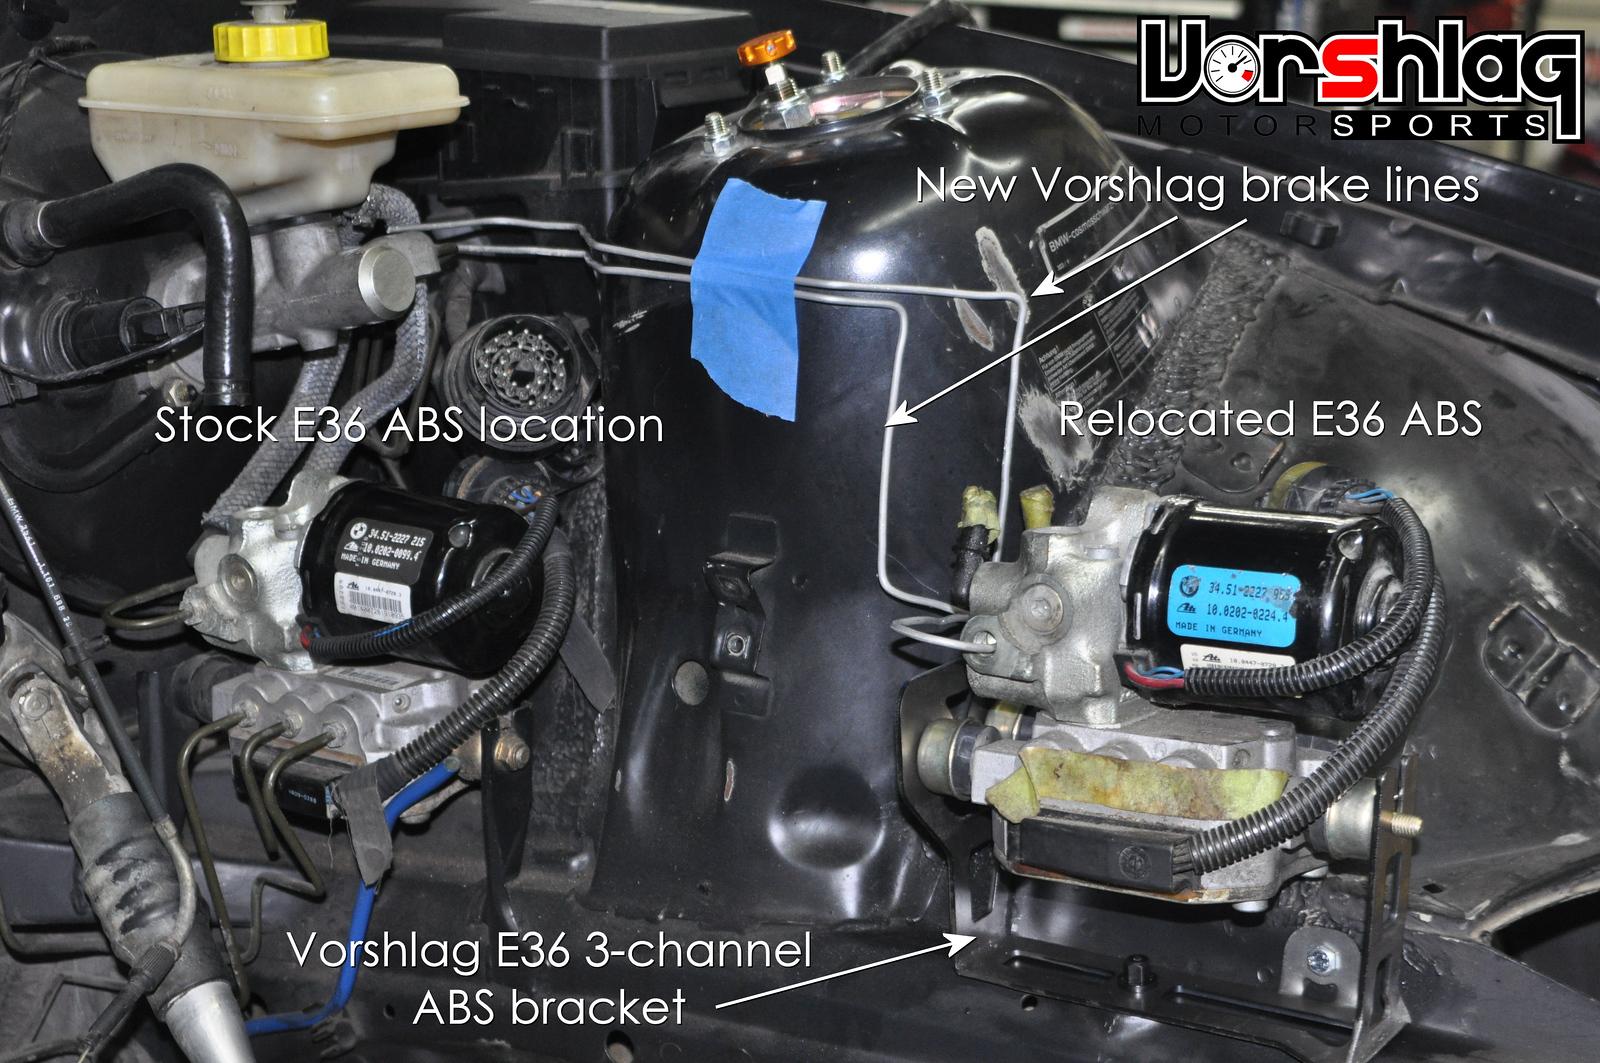 E36 LS Swap - ABS Relocation Kit instructions - Vorshlag Motorsports